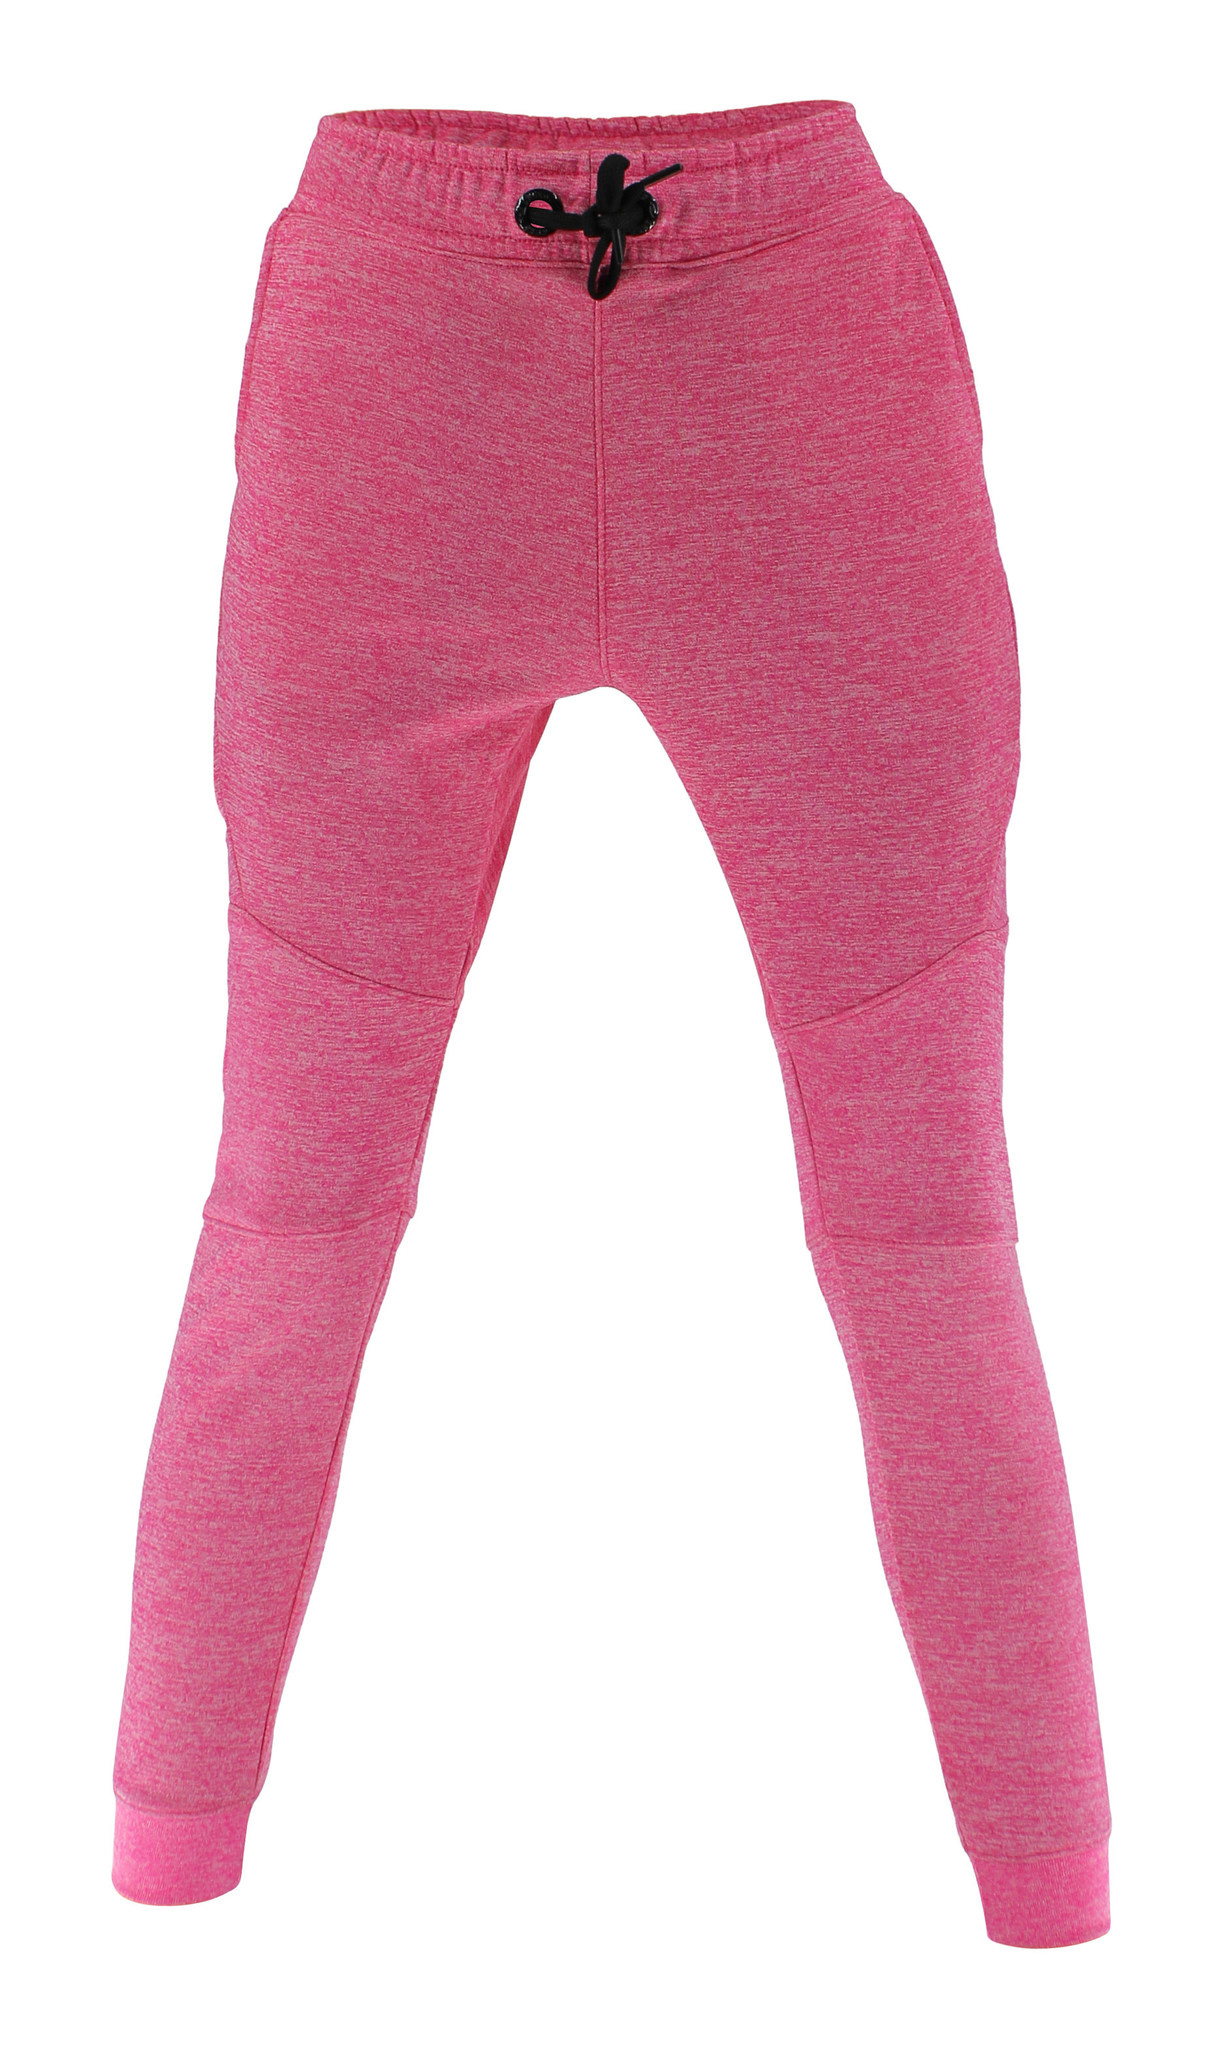 Truisweater damesheren SlimFit Design Legend Rood XXL